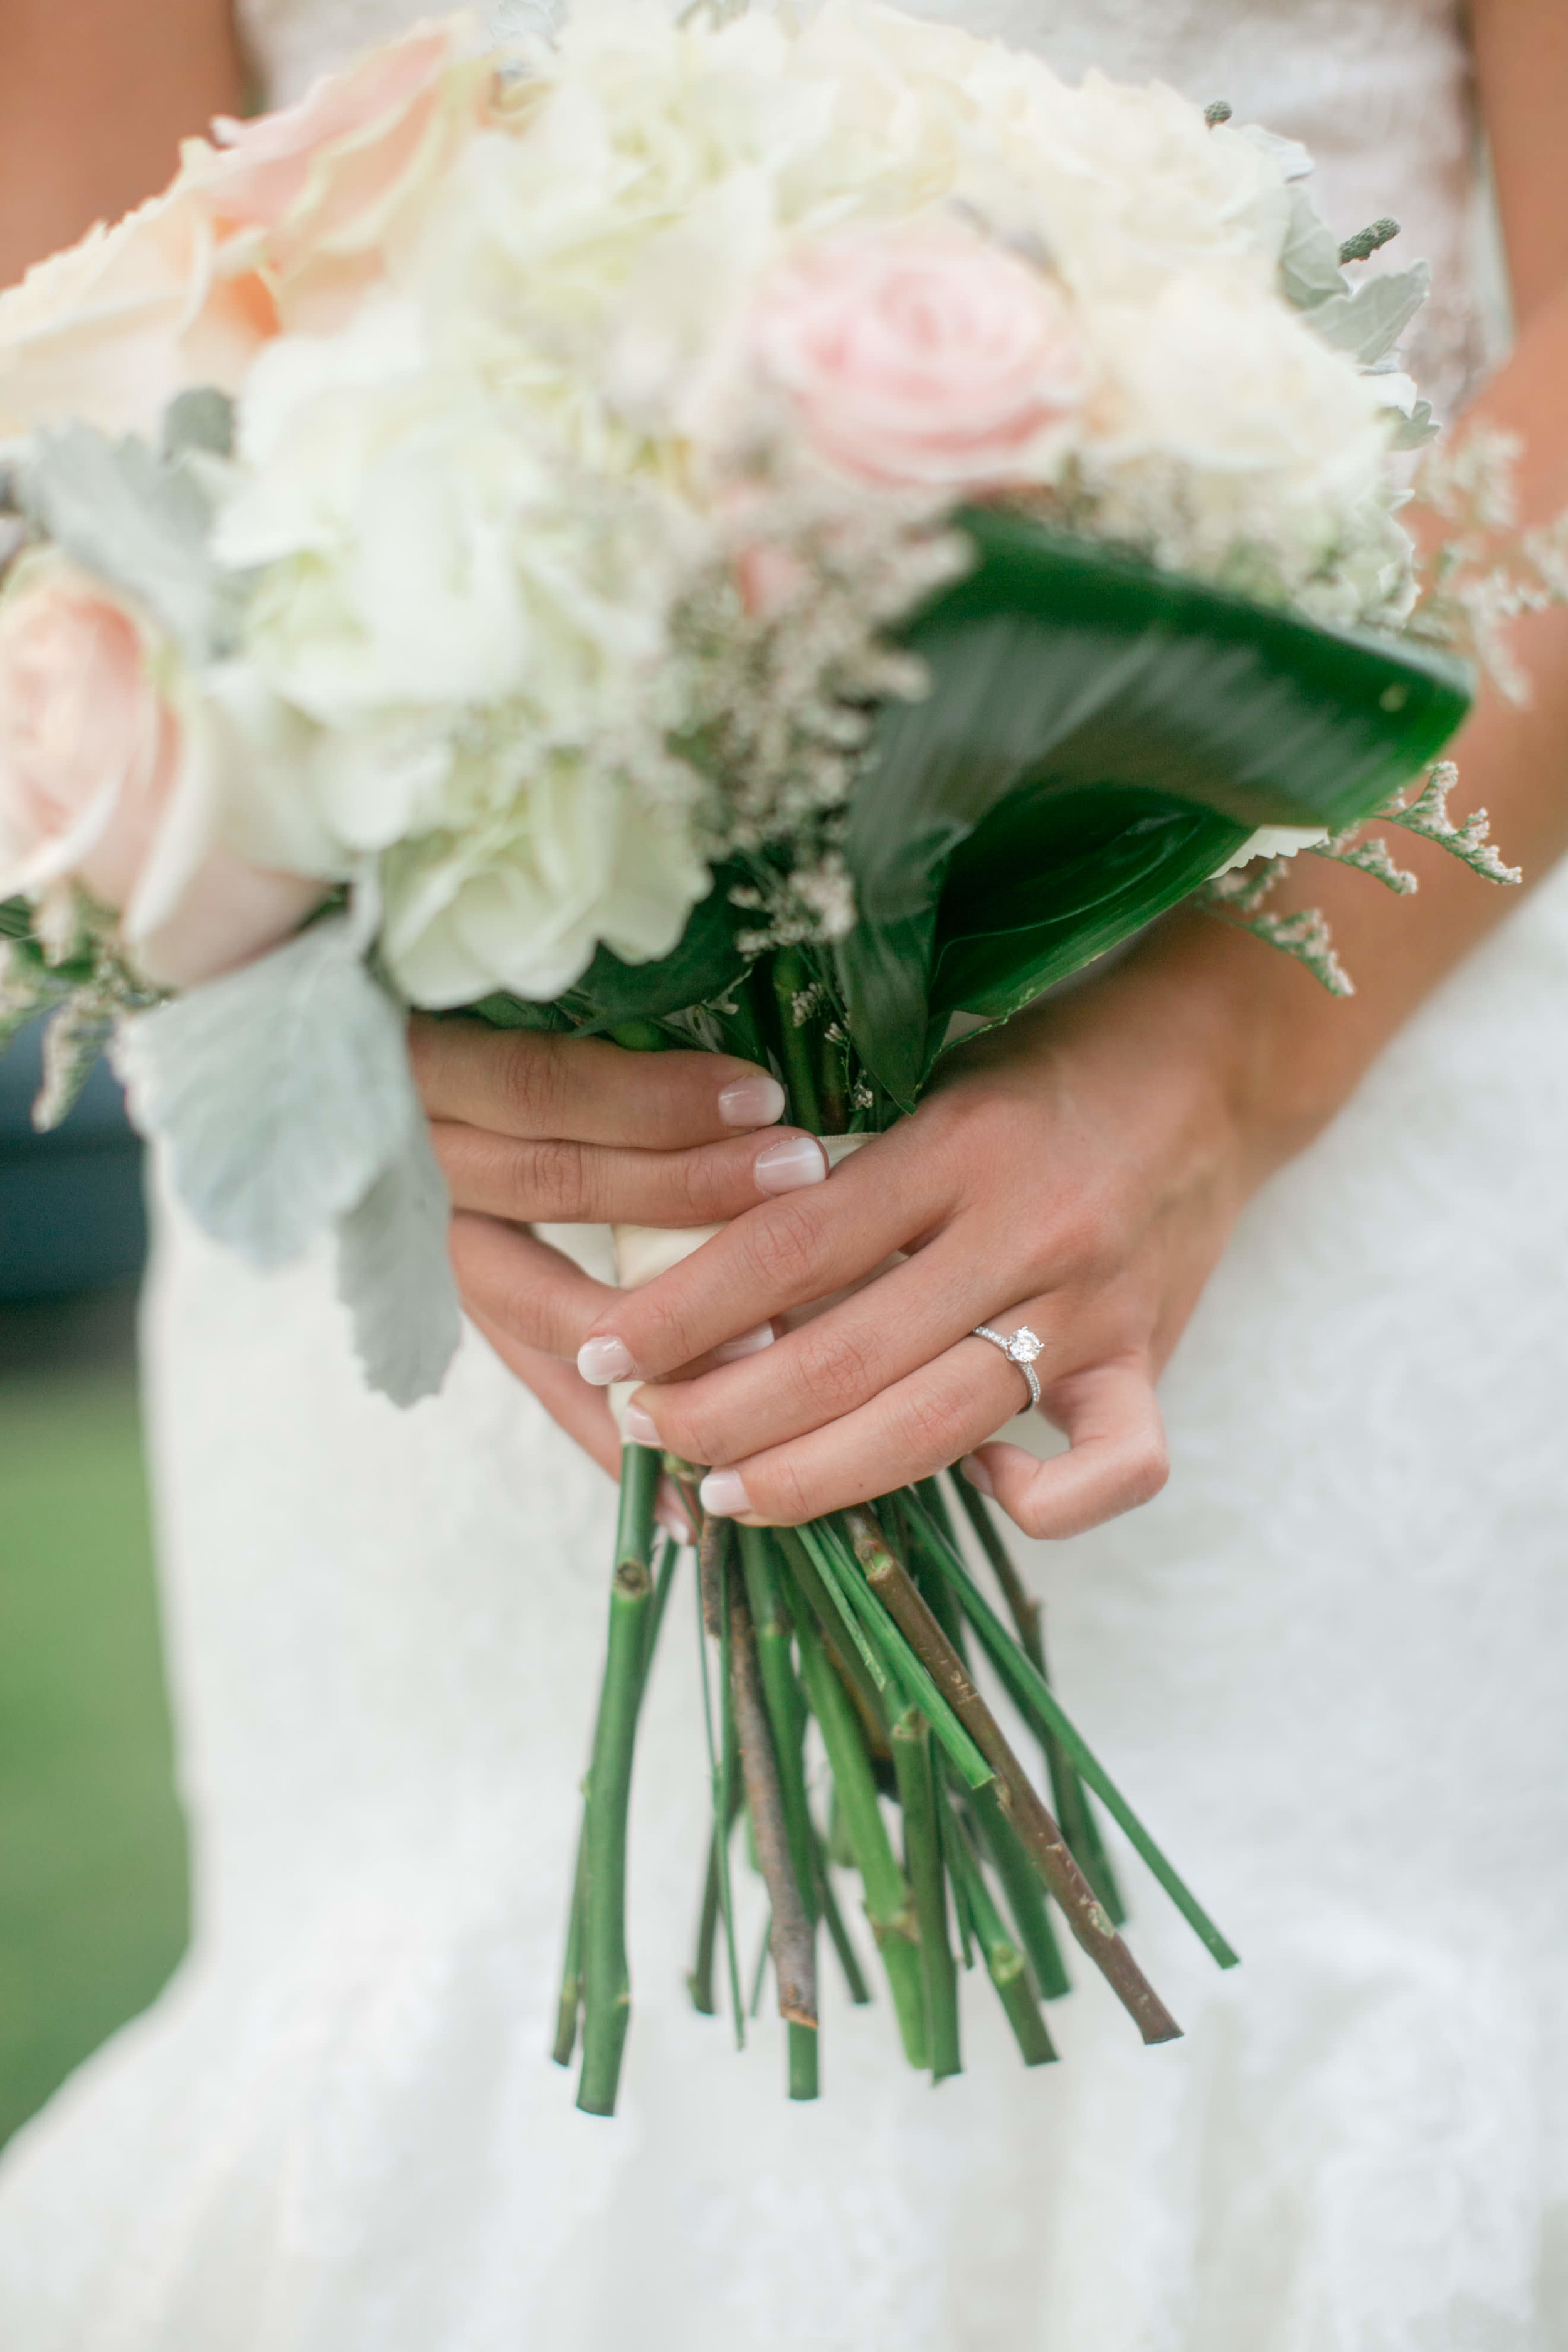 Stefanie___Bernard___Daniel_Ricci_Weddings_High_Res._Finals__133.jpg